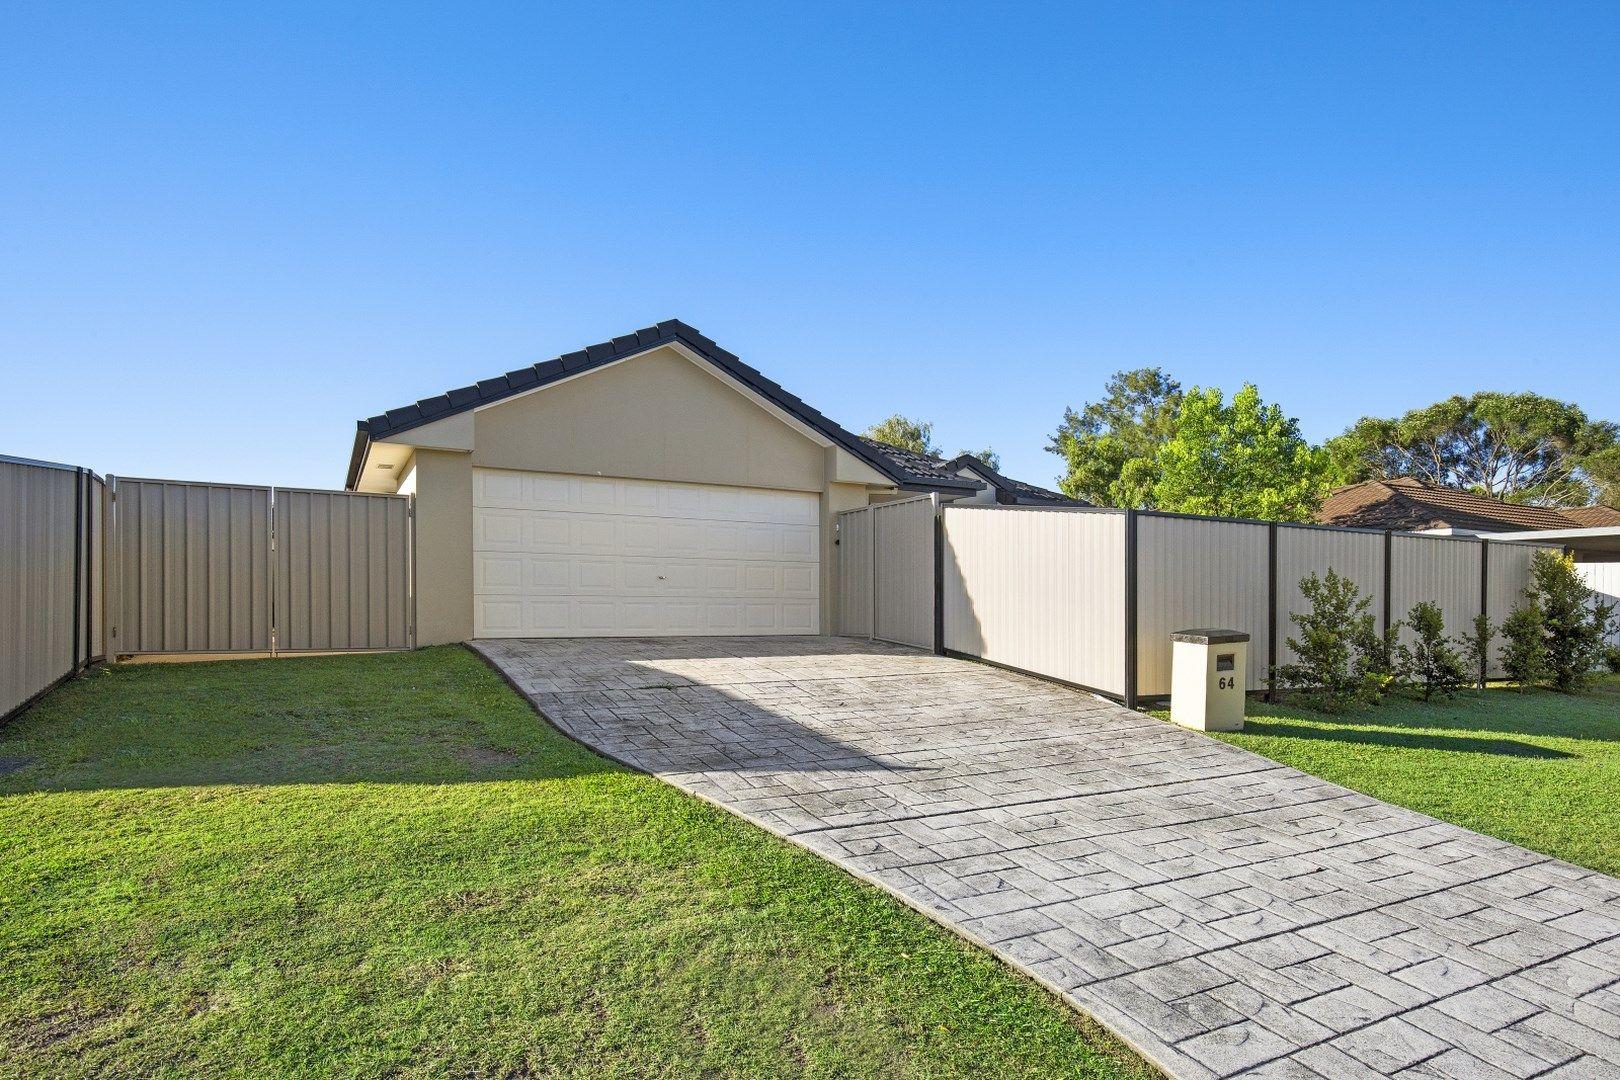 64 Kingarry Circuit, Merrimac QLD 4226, Image 0